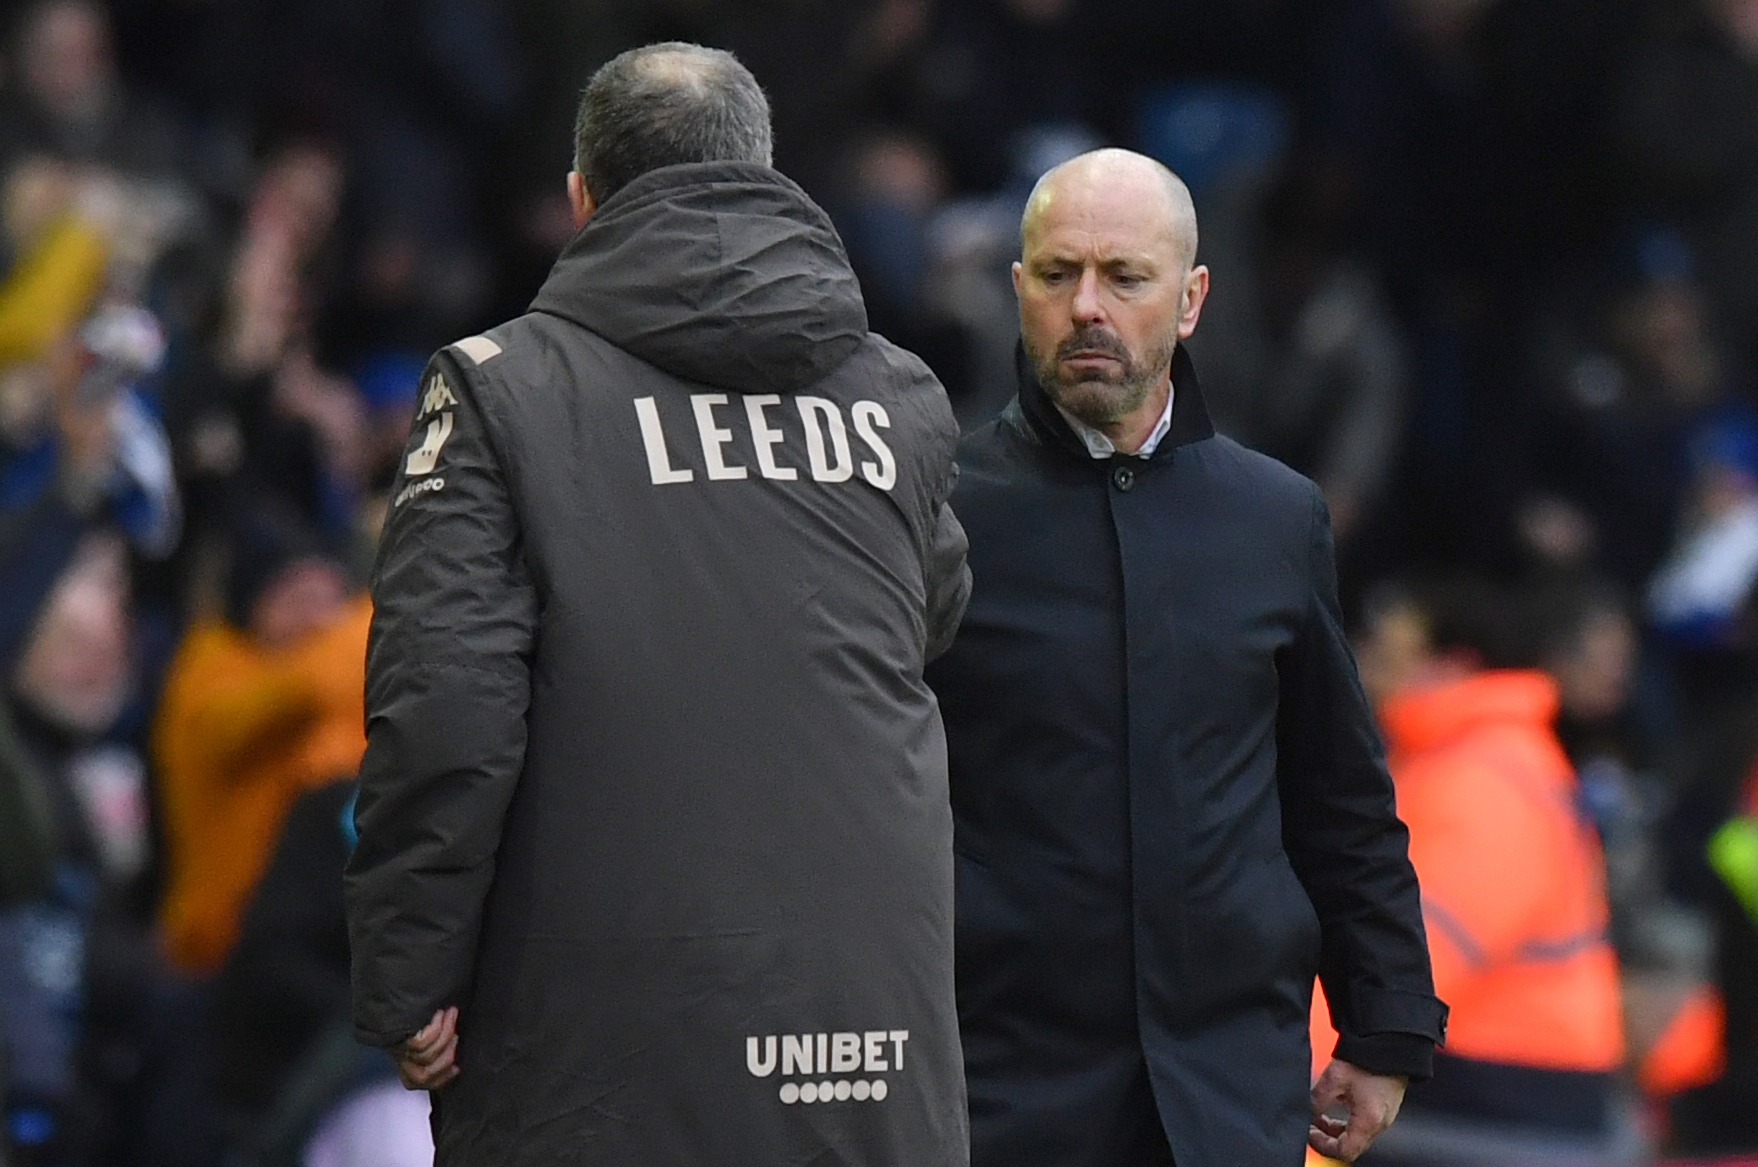 Leeds United v Reading - Sky Bet Championship - Elland Road